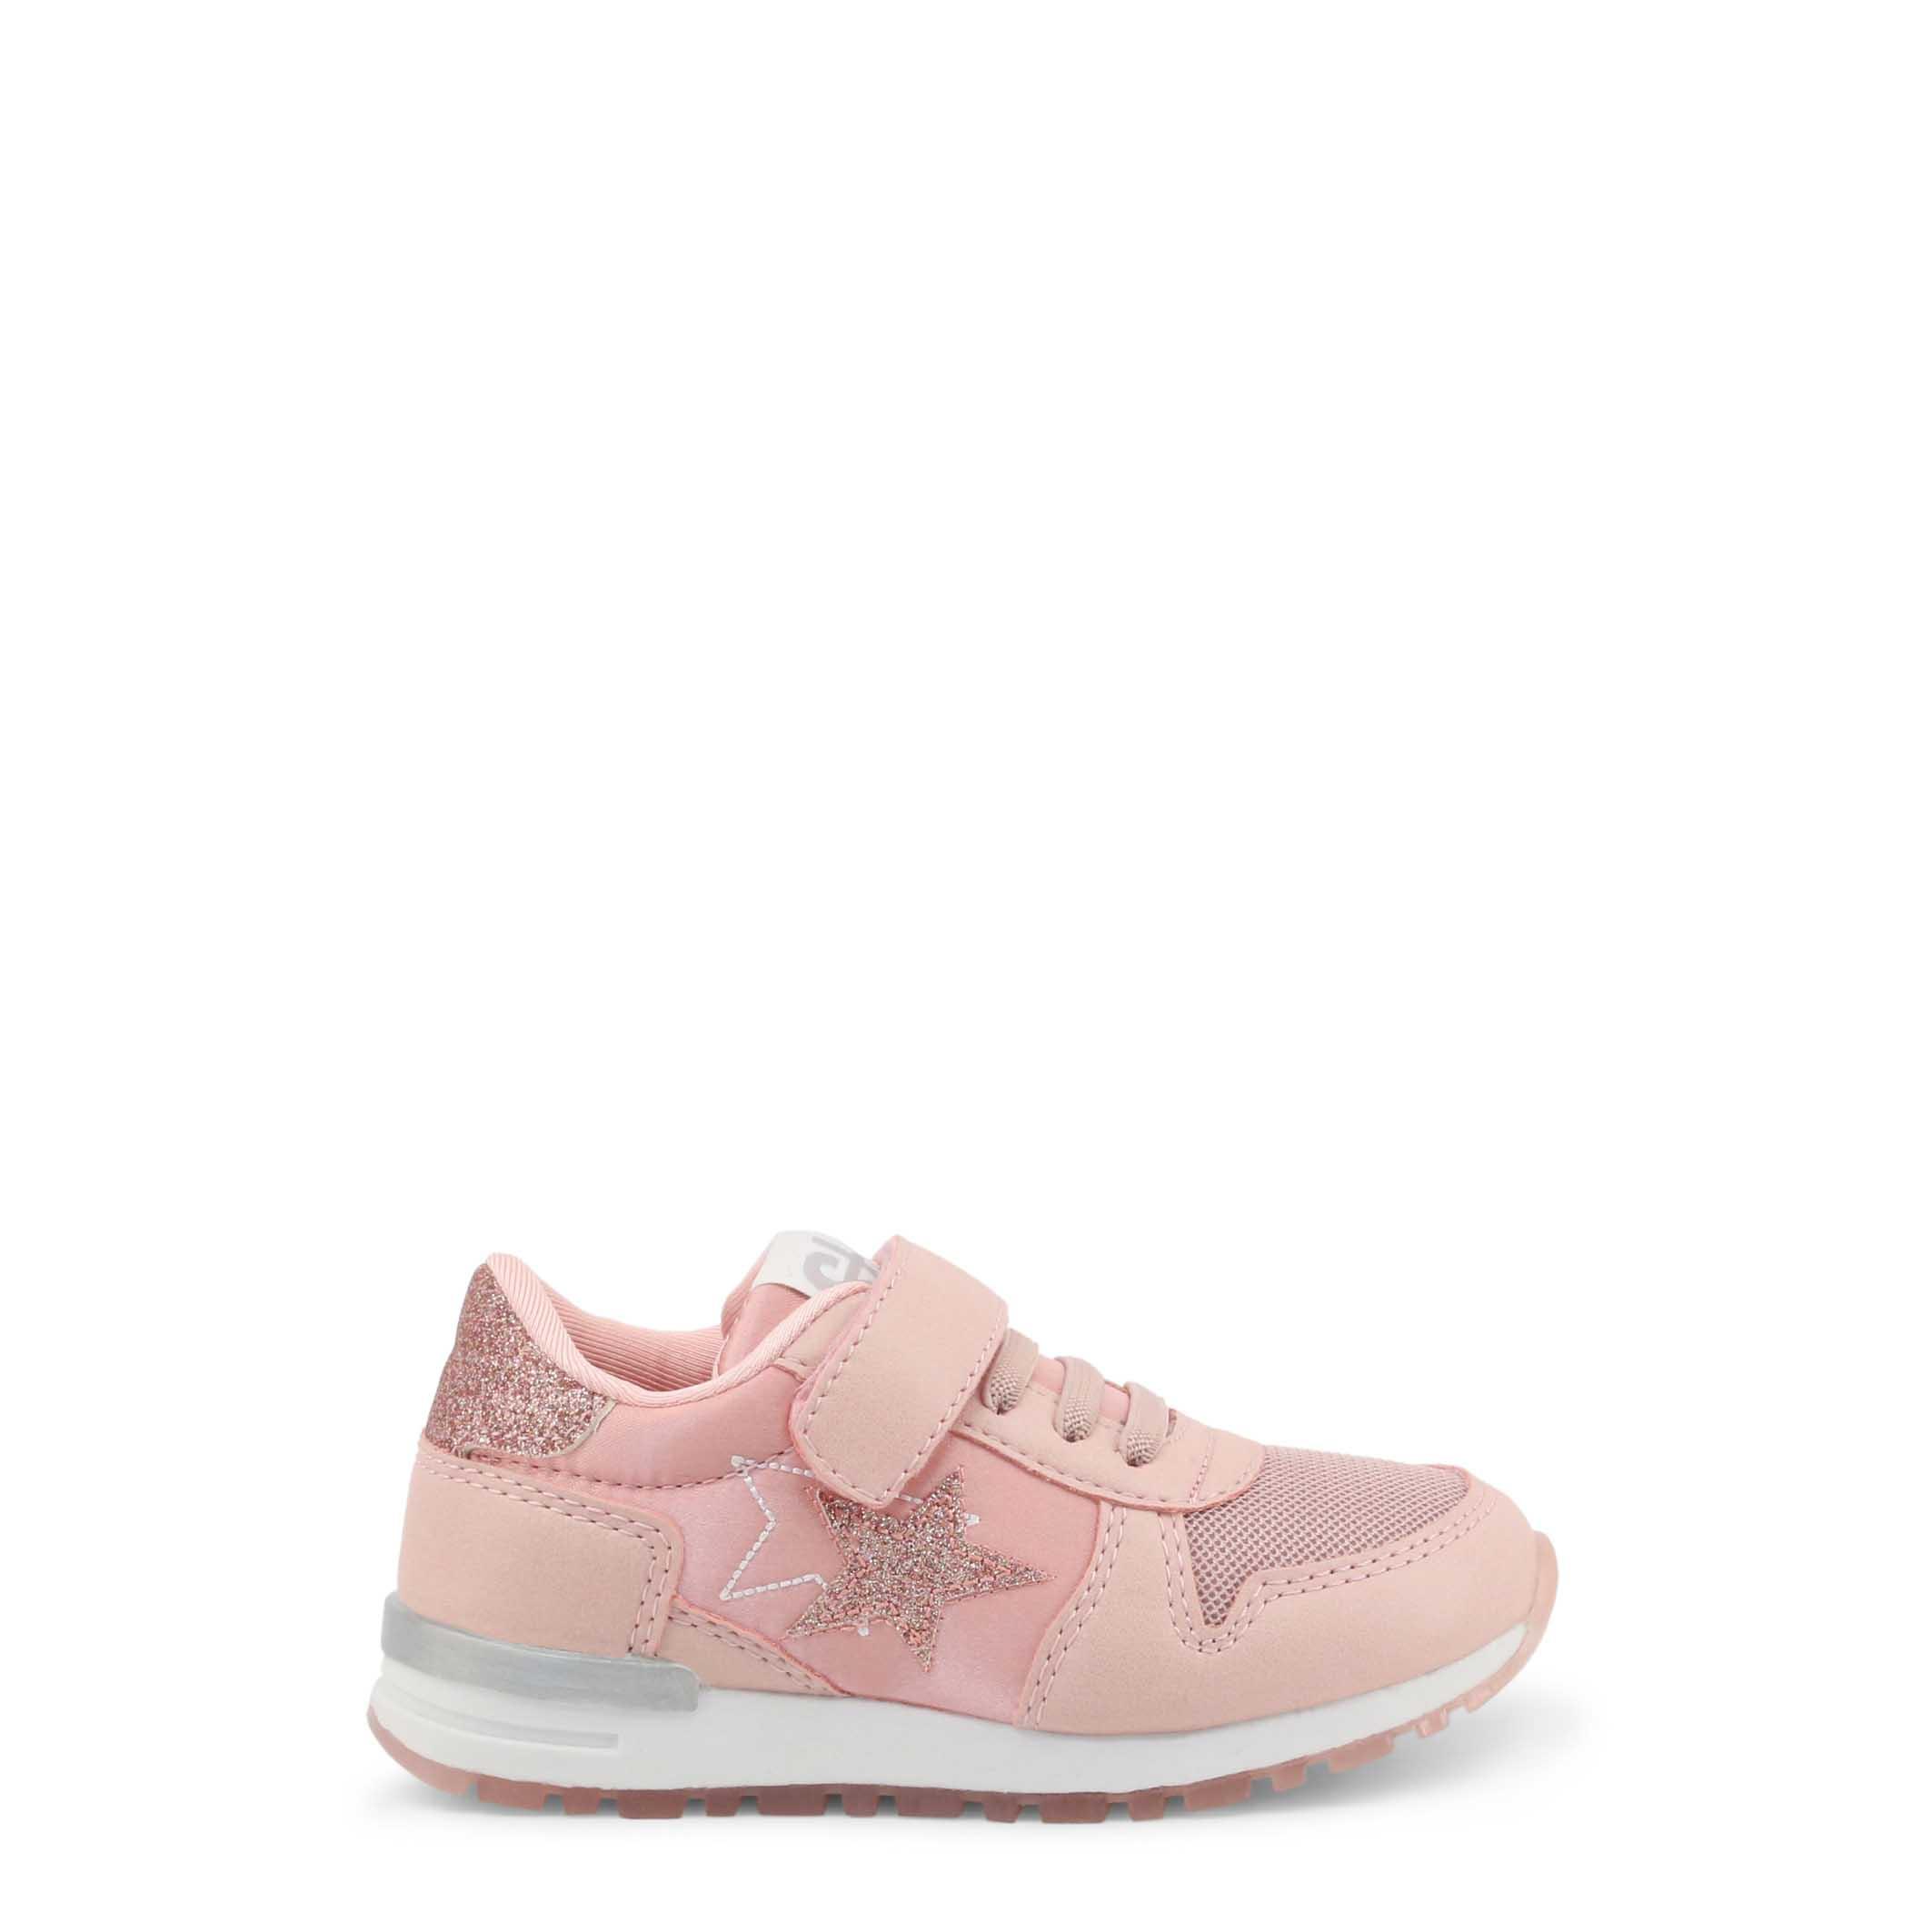 Shone - 6726-017 - Pink